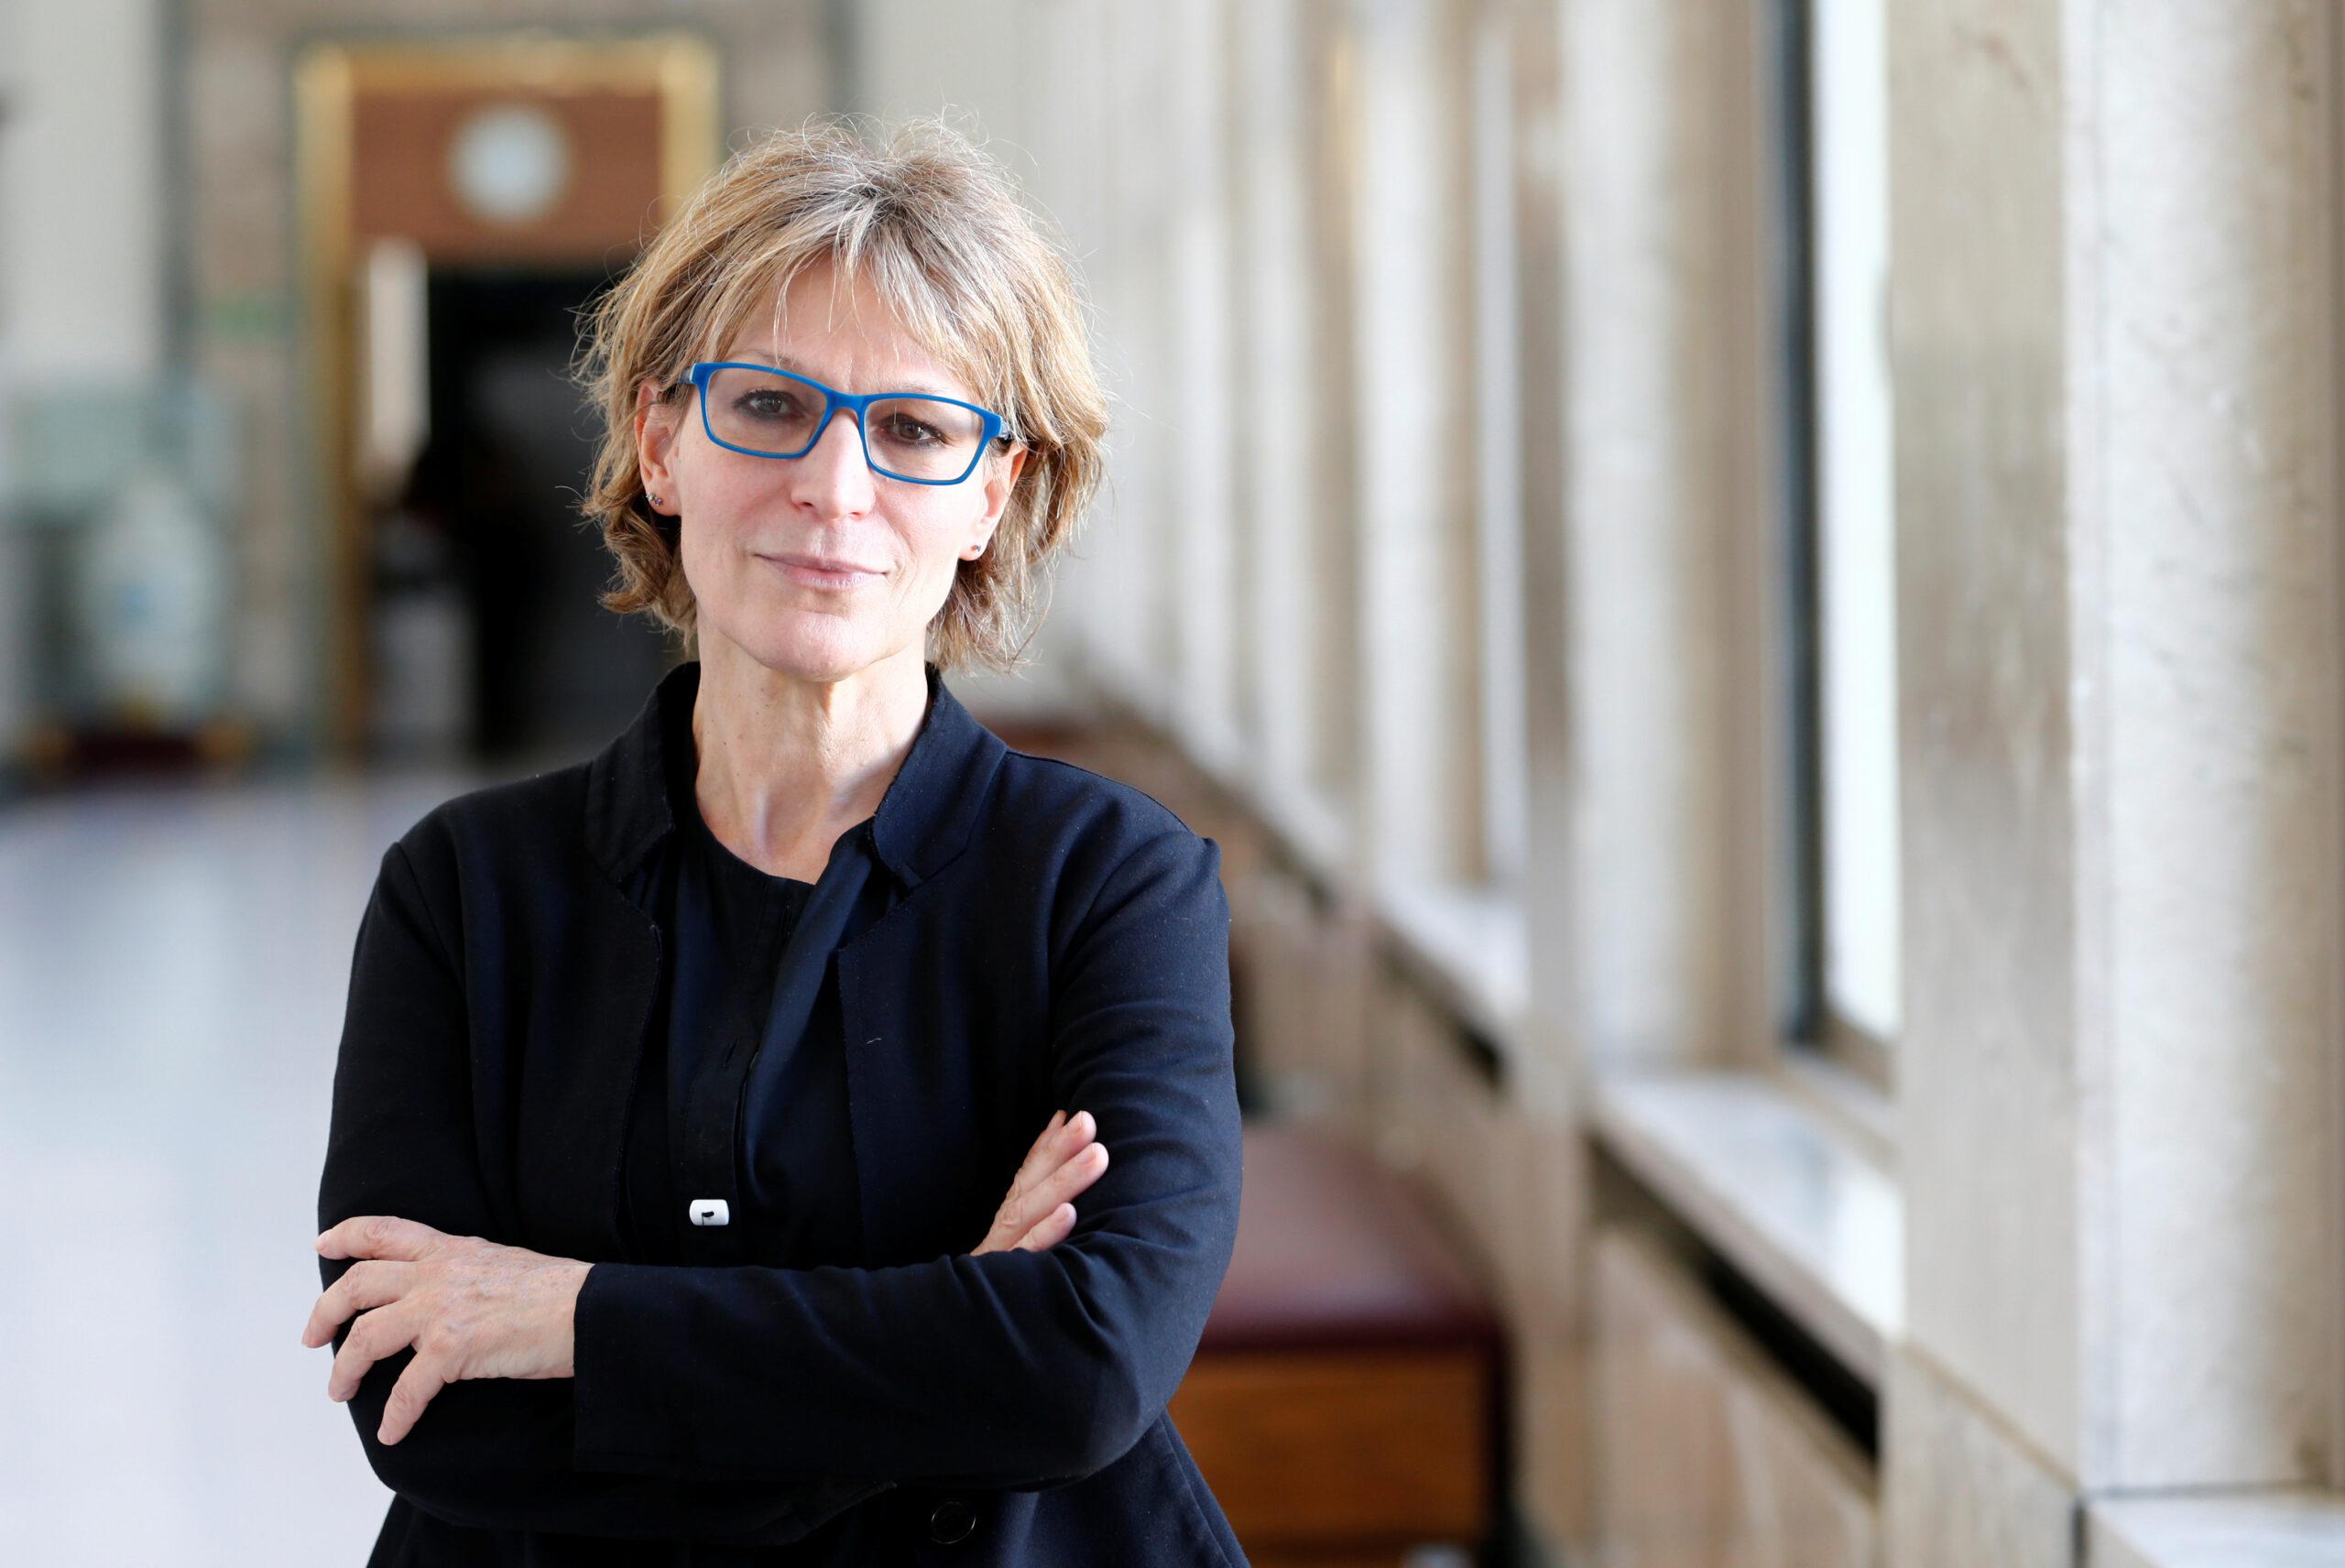 Dr. Agnès Callamard appointed as Secretary General of Amnesty International